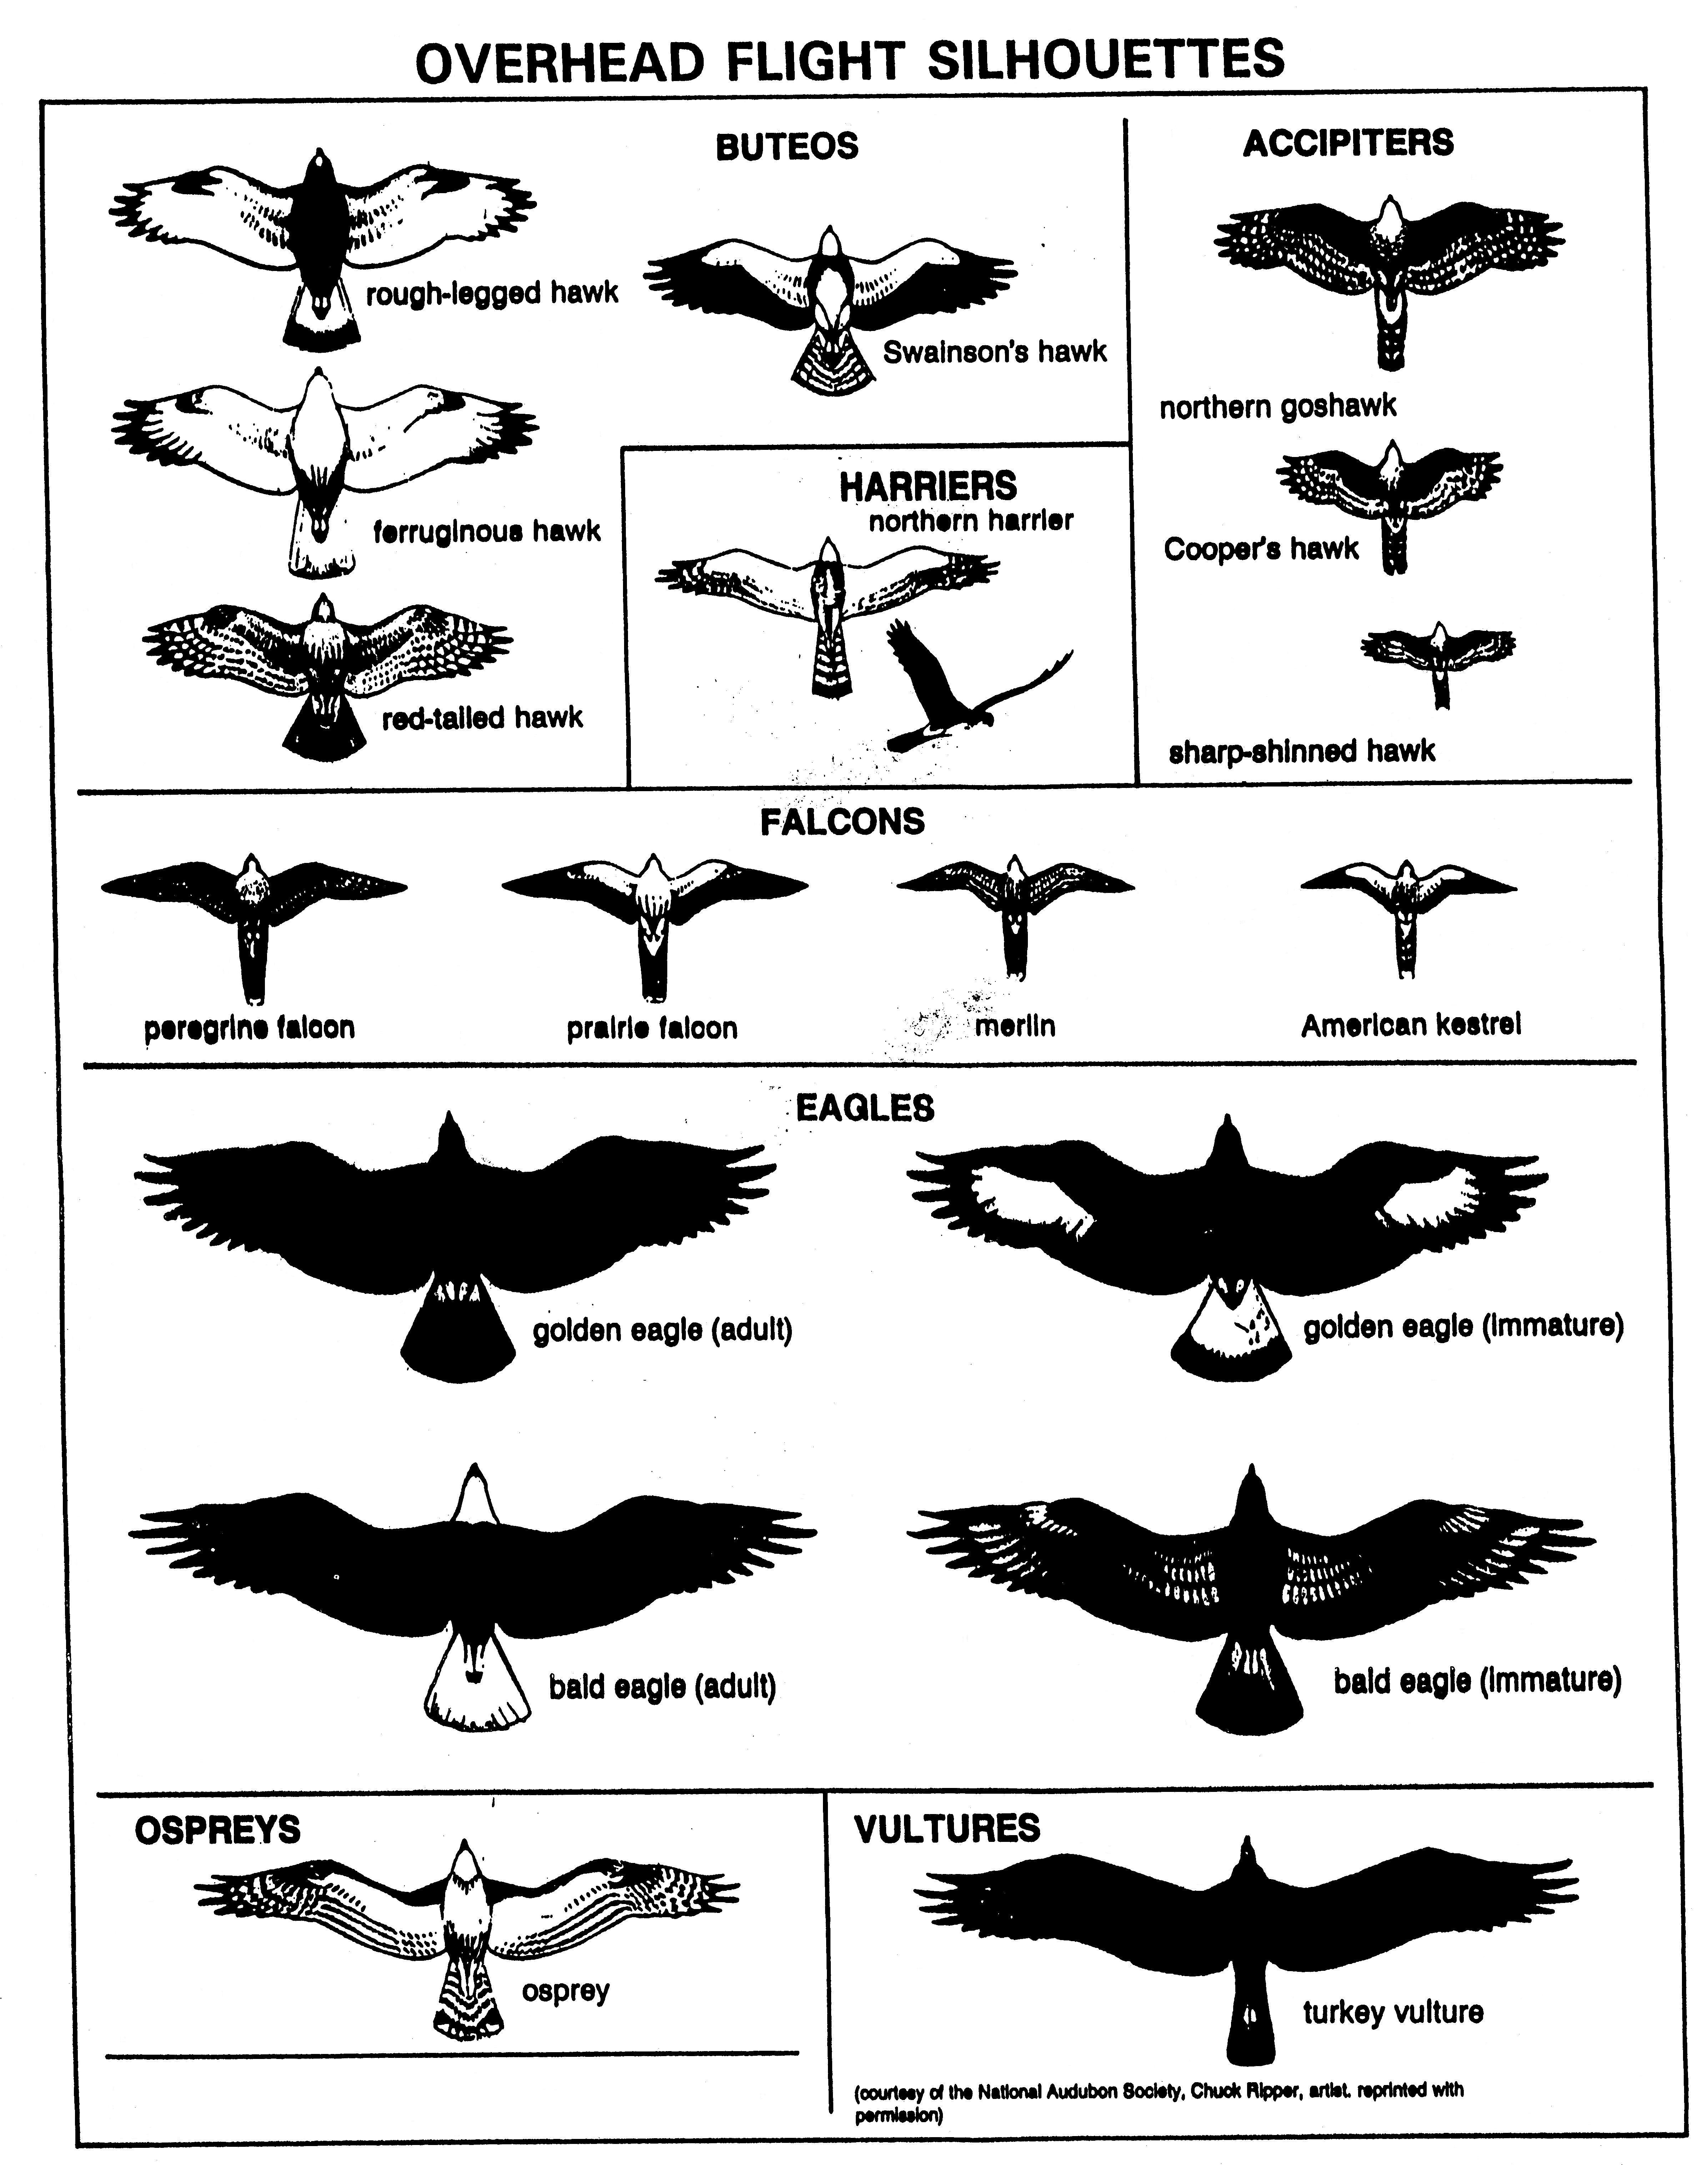 Flying Bird Silhouette Identification.